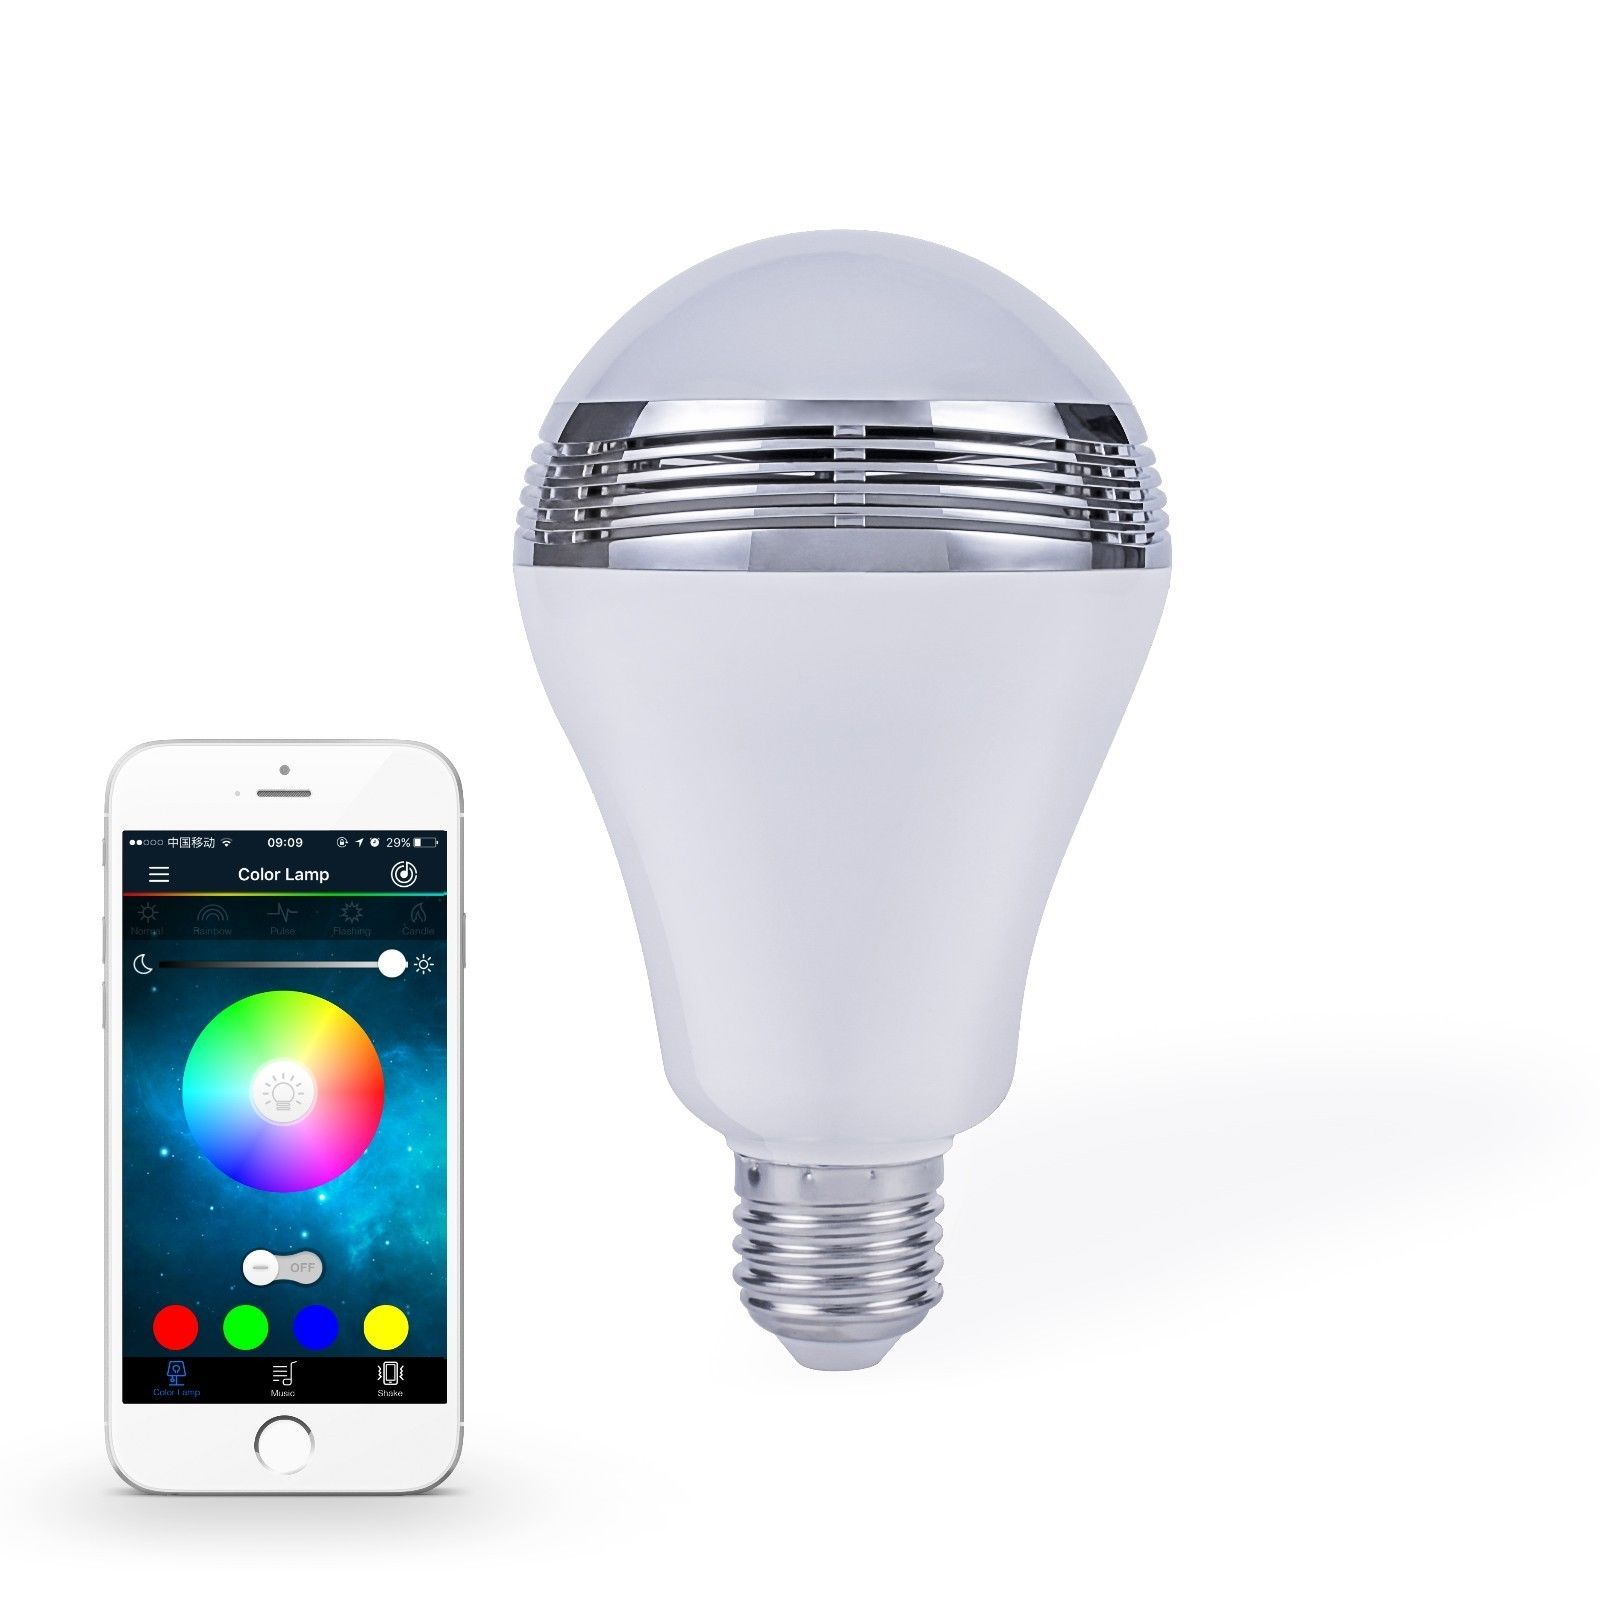 US $21 99 New in Home & Garden Lamps Lighting & Ceiling Fans